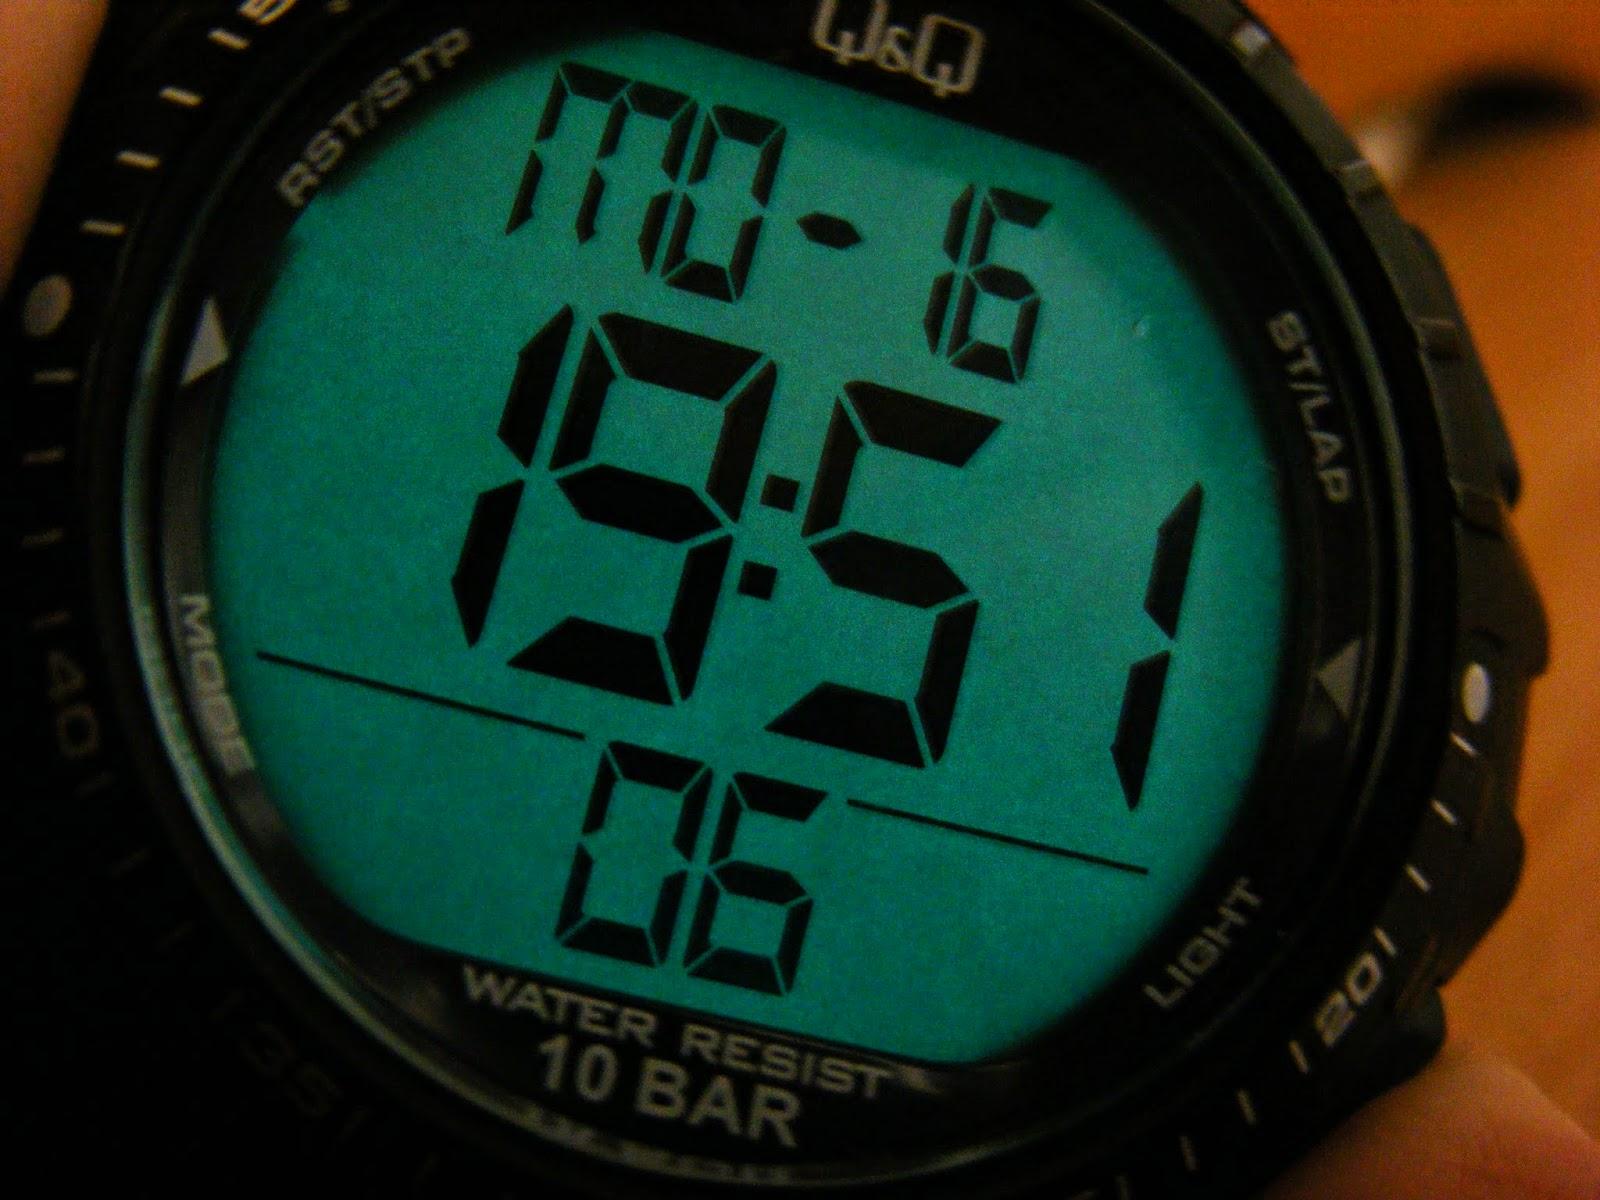 sport digital watch night mode qq running watch sports laps